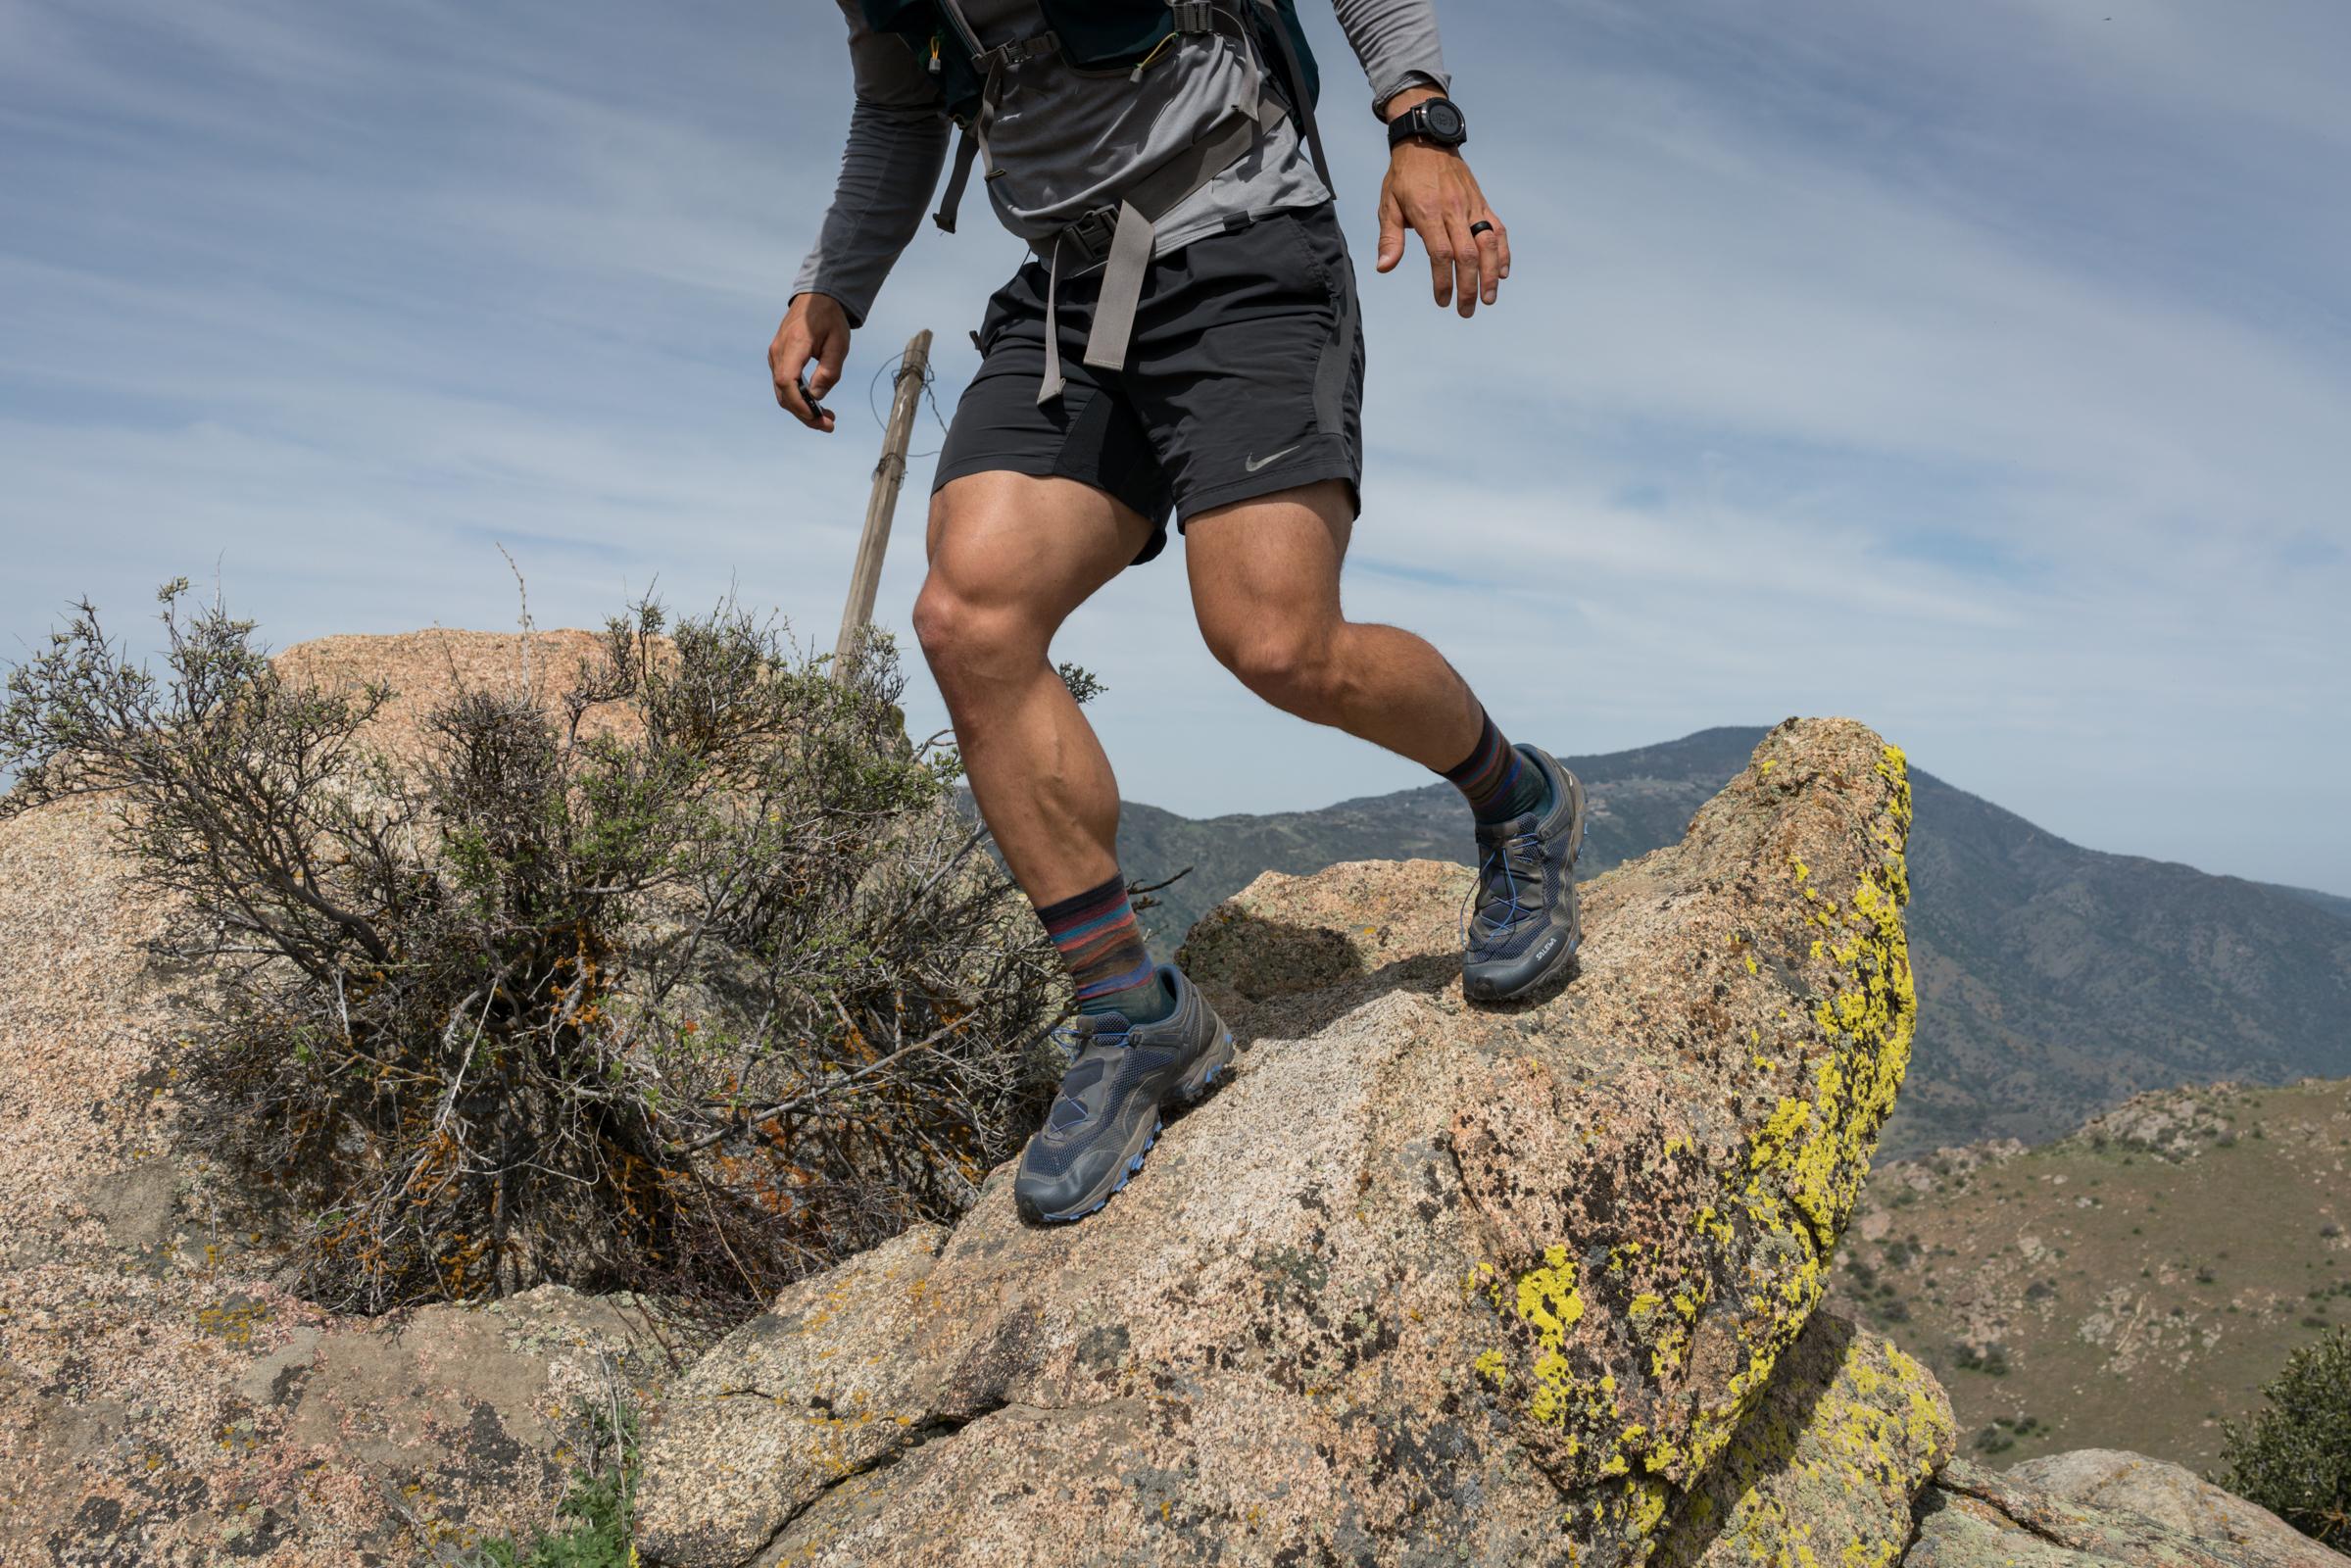 Gear Review: Salewa Ultra Train 2 Hiking Shoe Trail to Peak